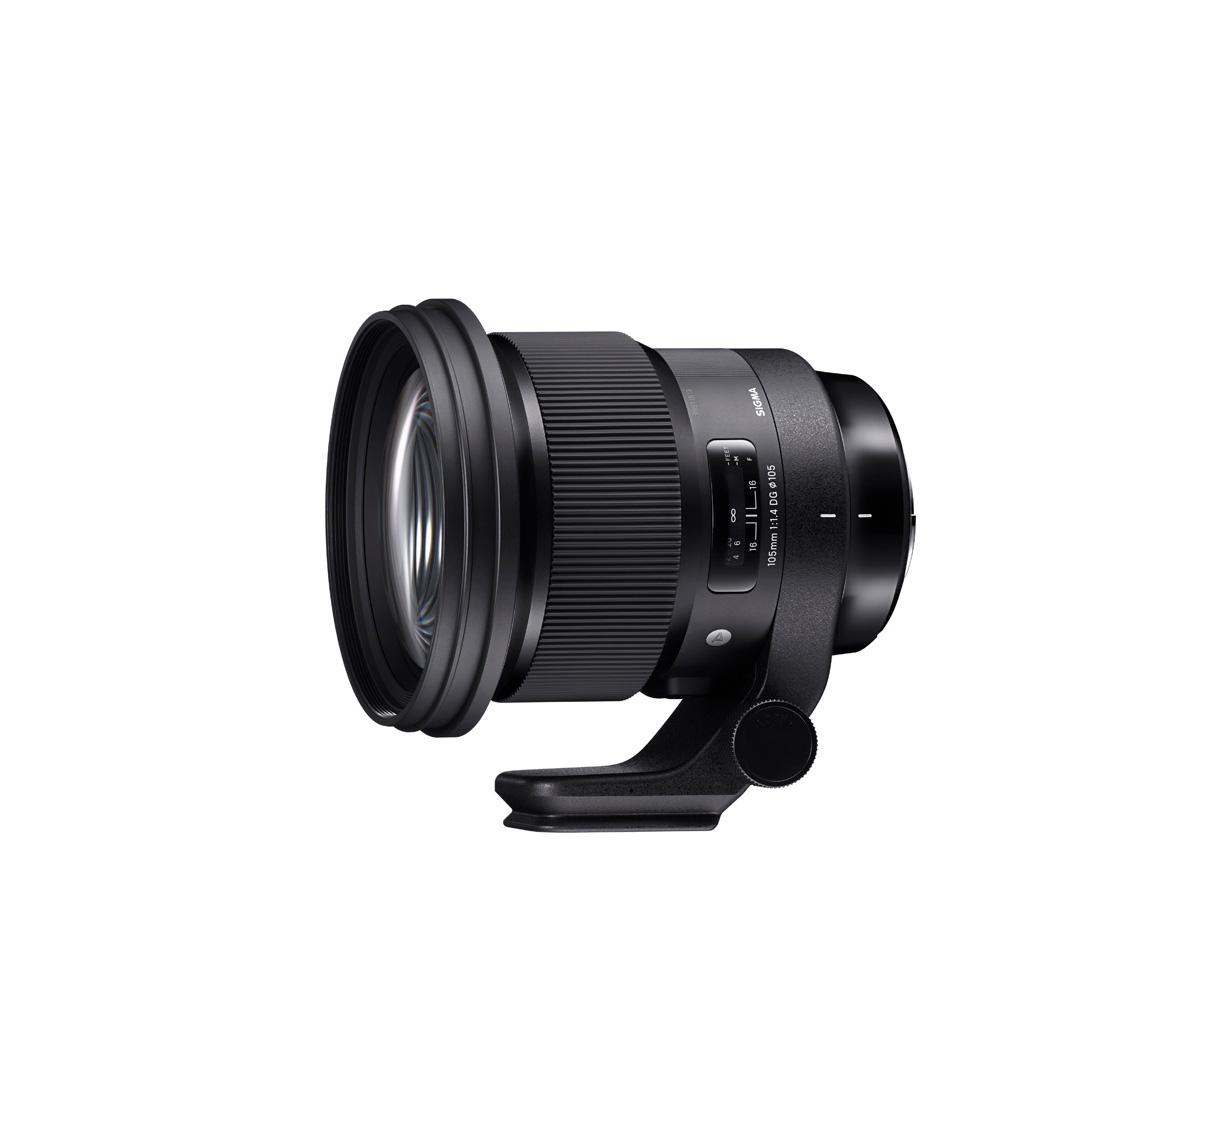 لنز Sigma 105mm f1.4 DG HSM Art for SONY E